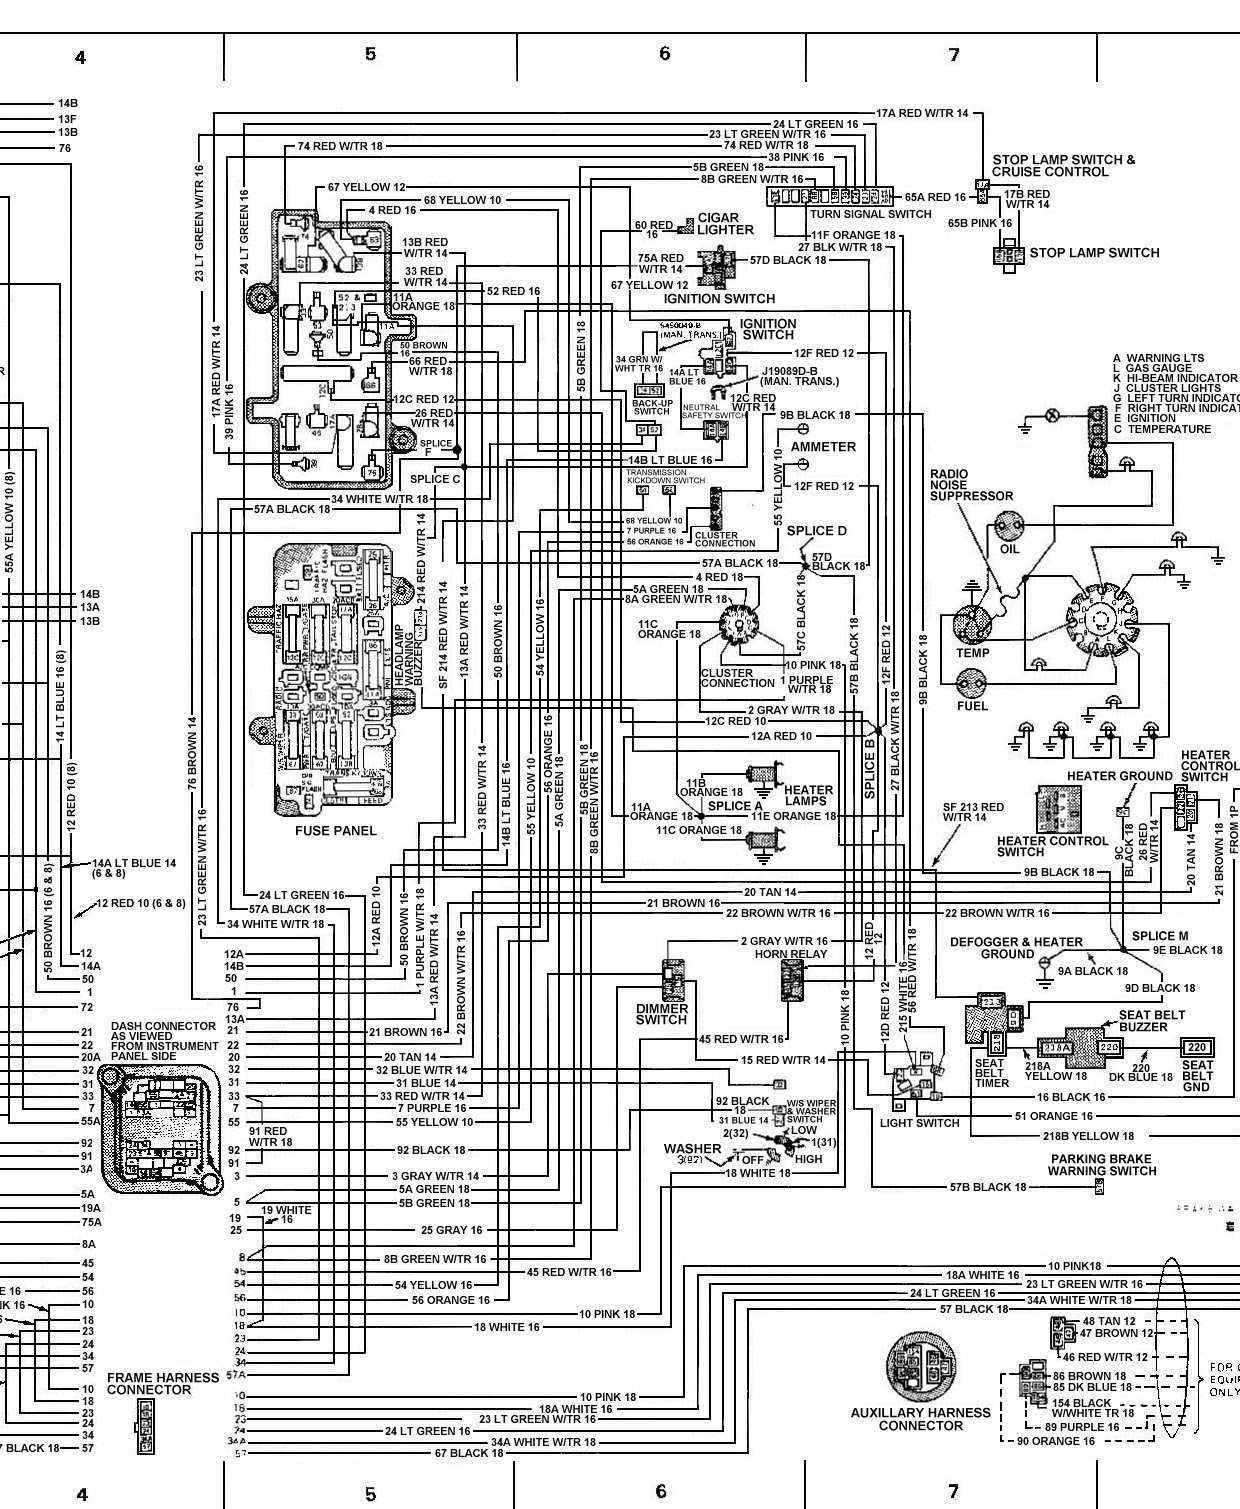 [CSDW_4250]   BW_1795] 2007 Dodge Sprinter Wiring Diagram Free Diagram | 2008 Dodge Sprinter Wiring Schematic |  | Acion Inoma Ultr Xeira Mohammedshrine Librar Wiring 101